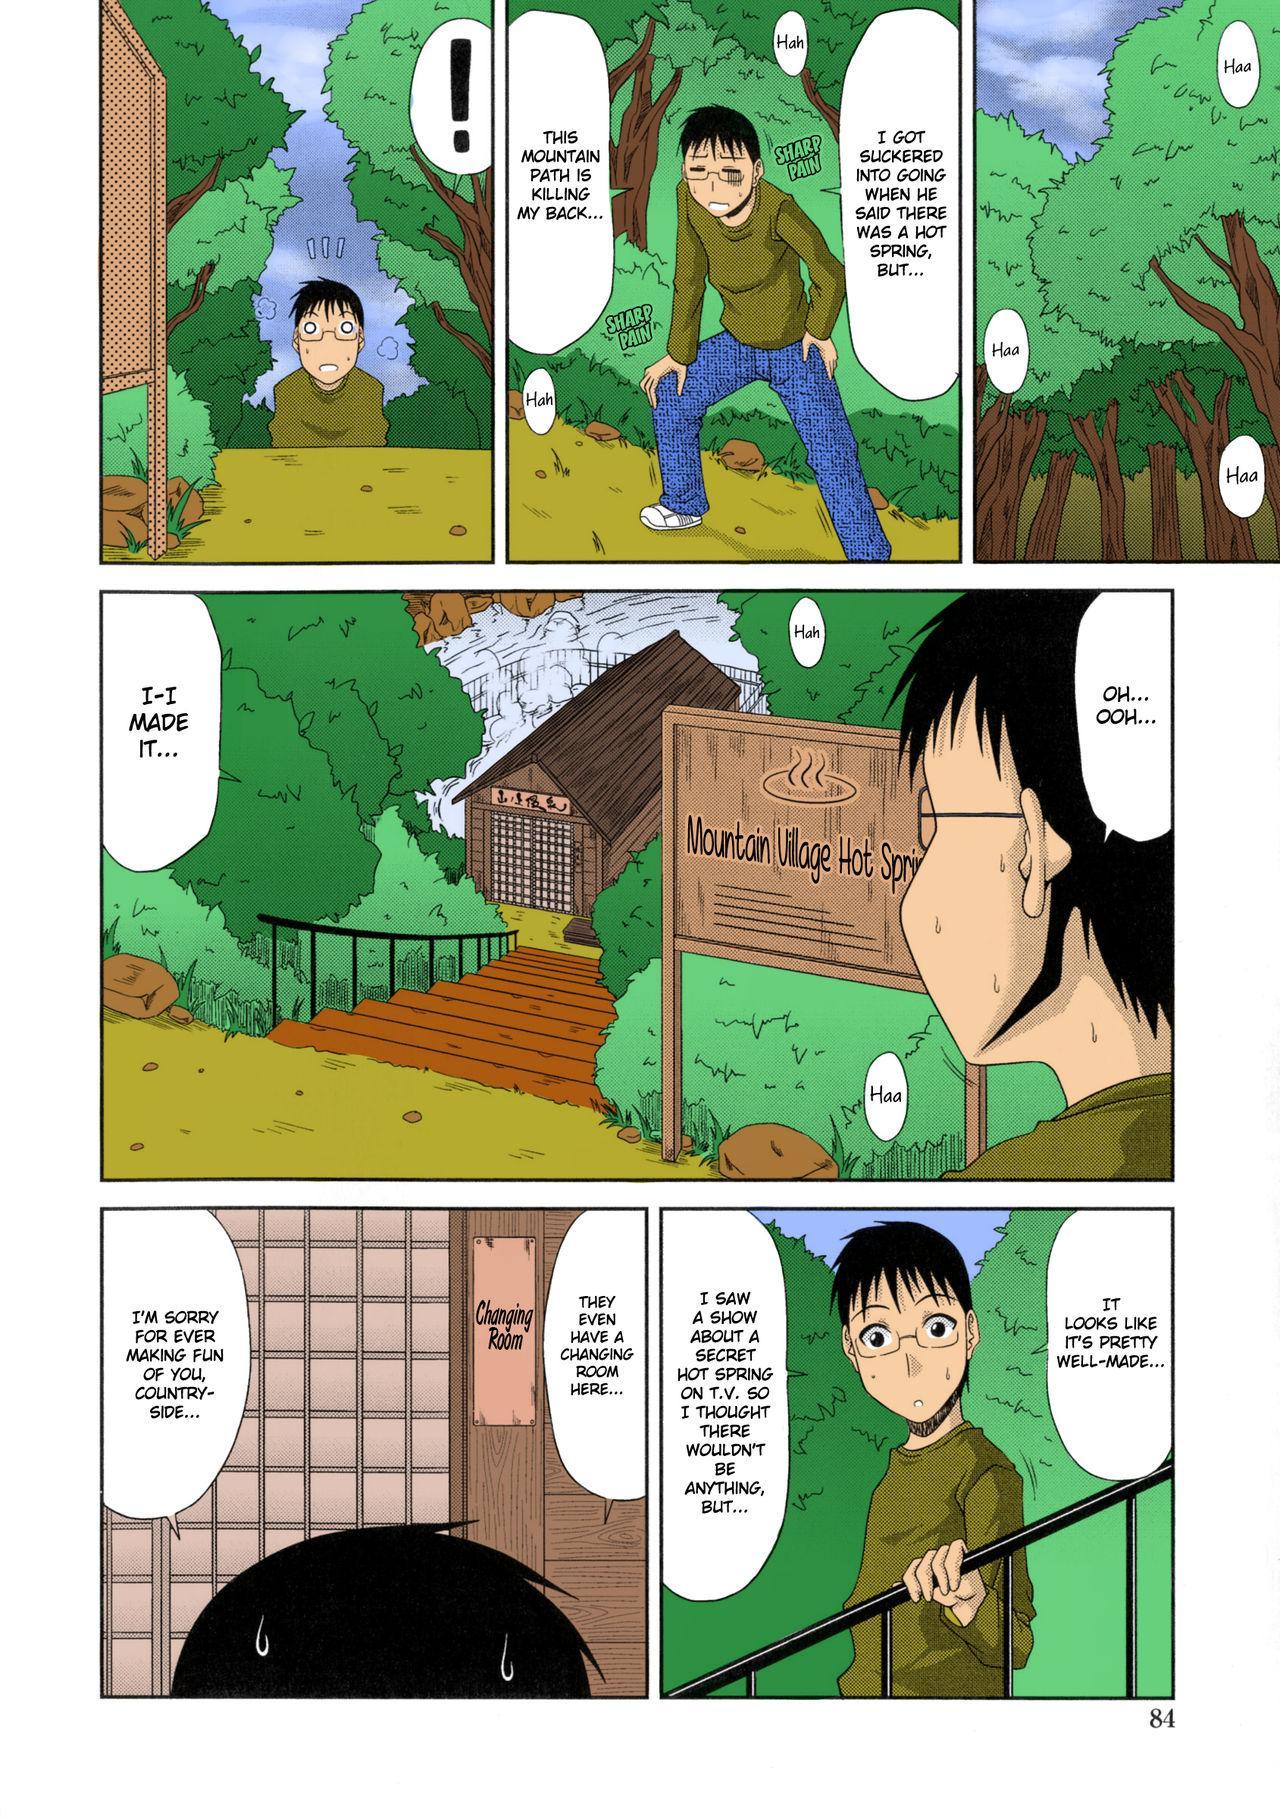 Boku no Yamanoue-mura Haramase Nikki | My Mountain Village Pregnancy Diary 86